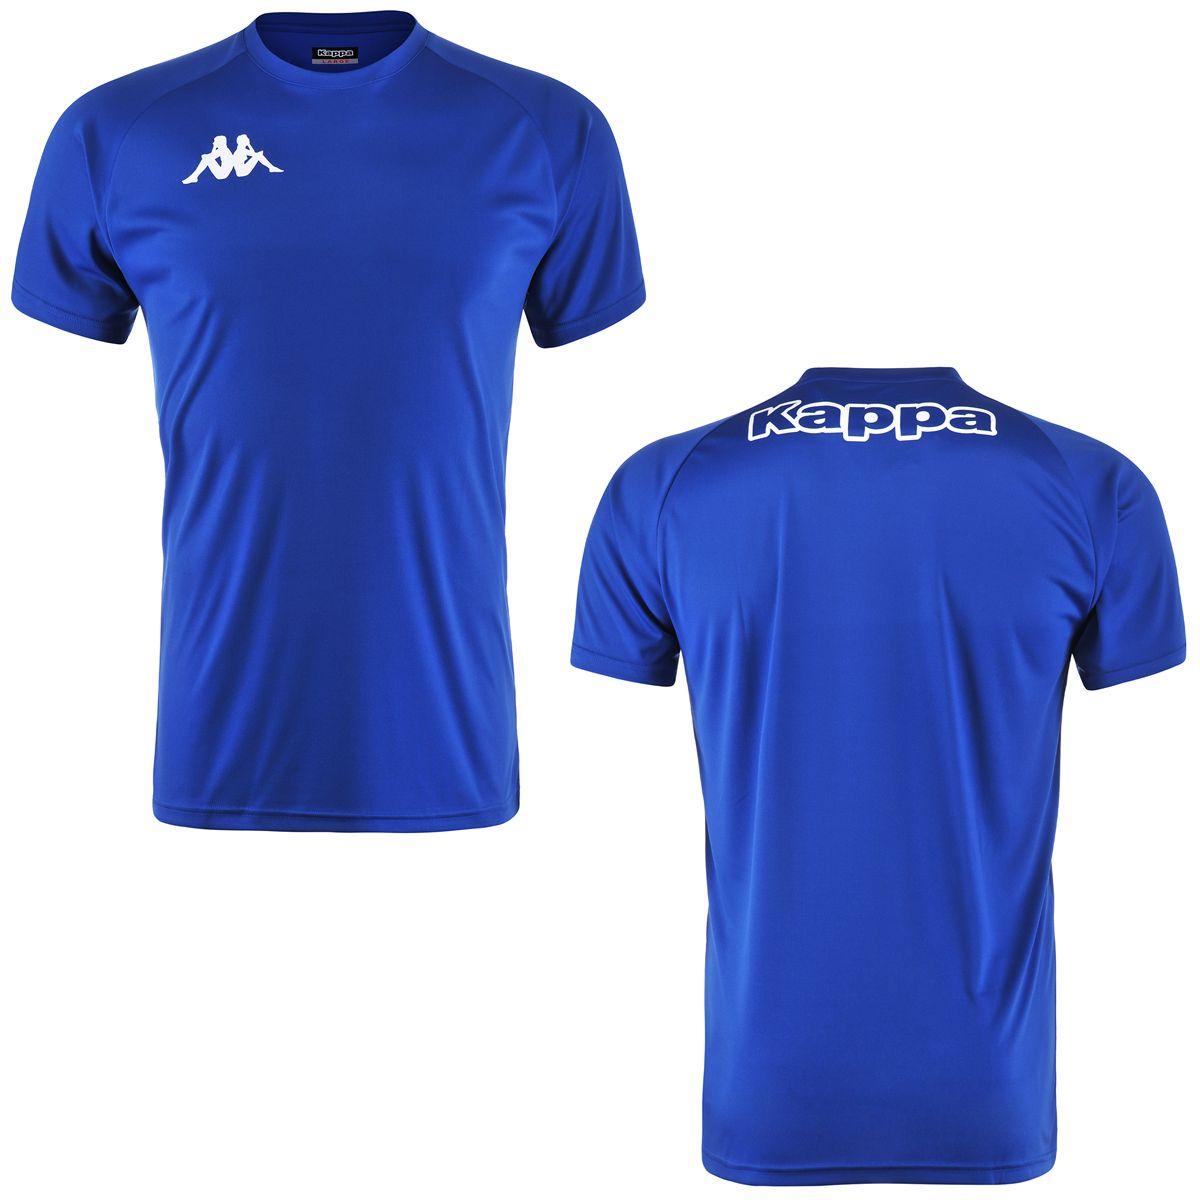 Kappa T-shirt sportiva KAPPA4BASKET ANTEL Bambino Pallacanestro Basket sport